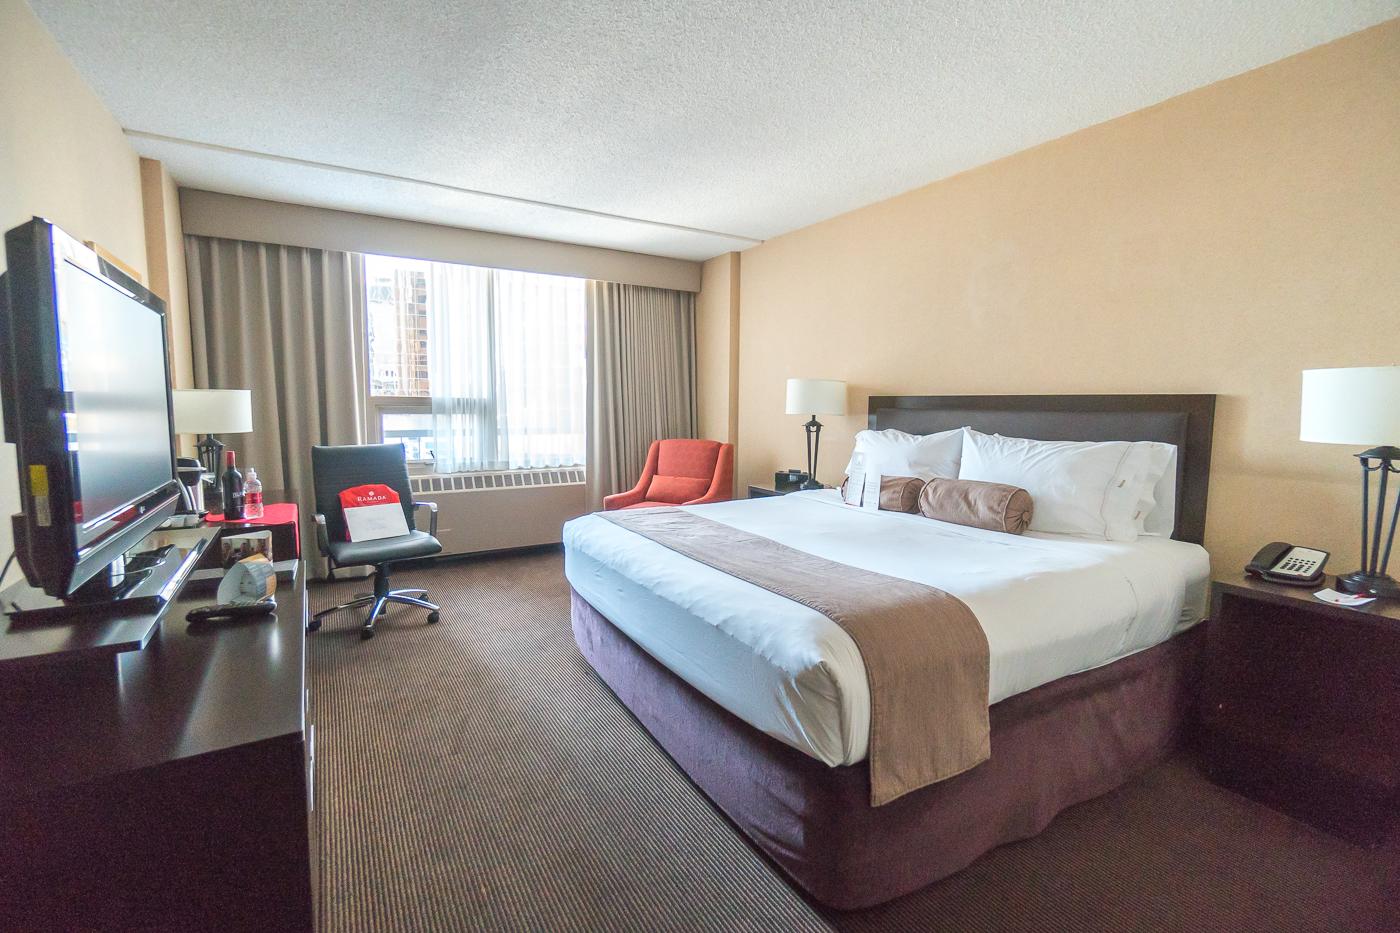 Chambre classique au Ramada Plaza Hotel - Où dormir dans le Downtown Calgary